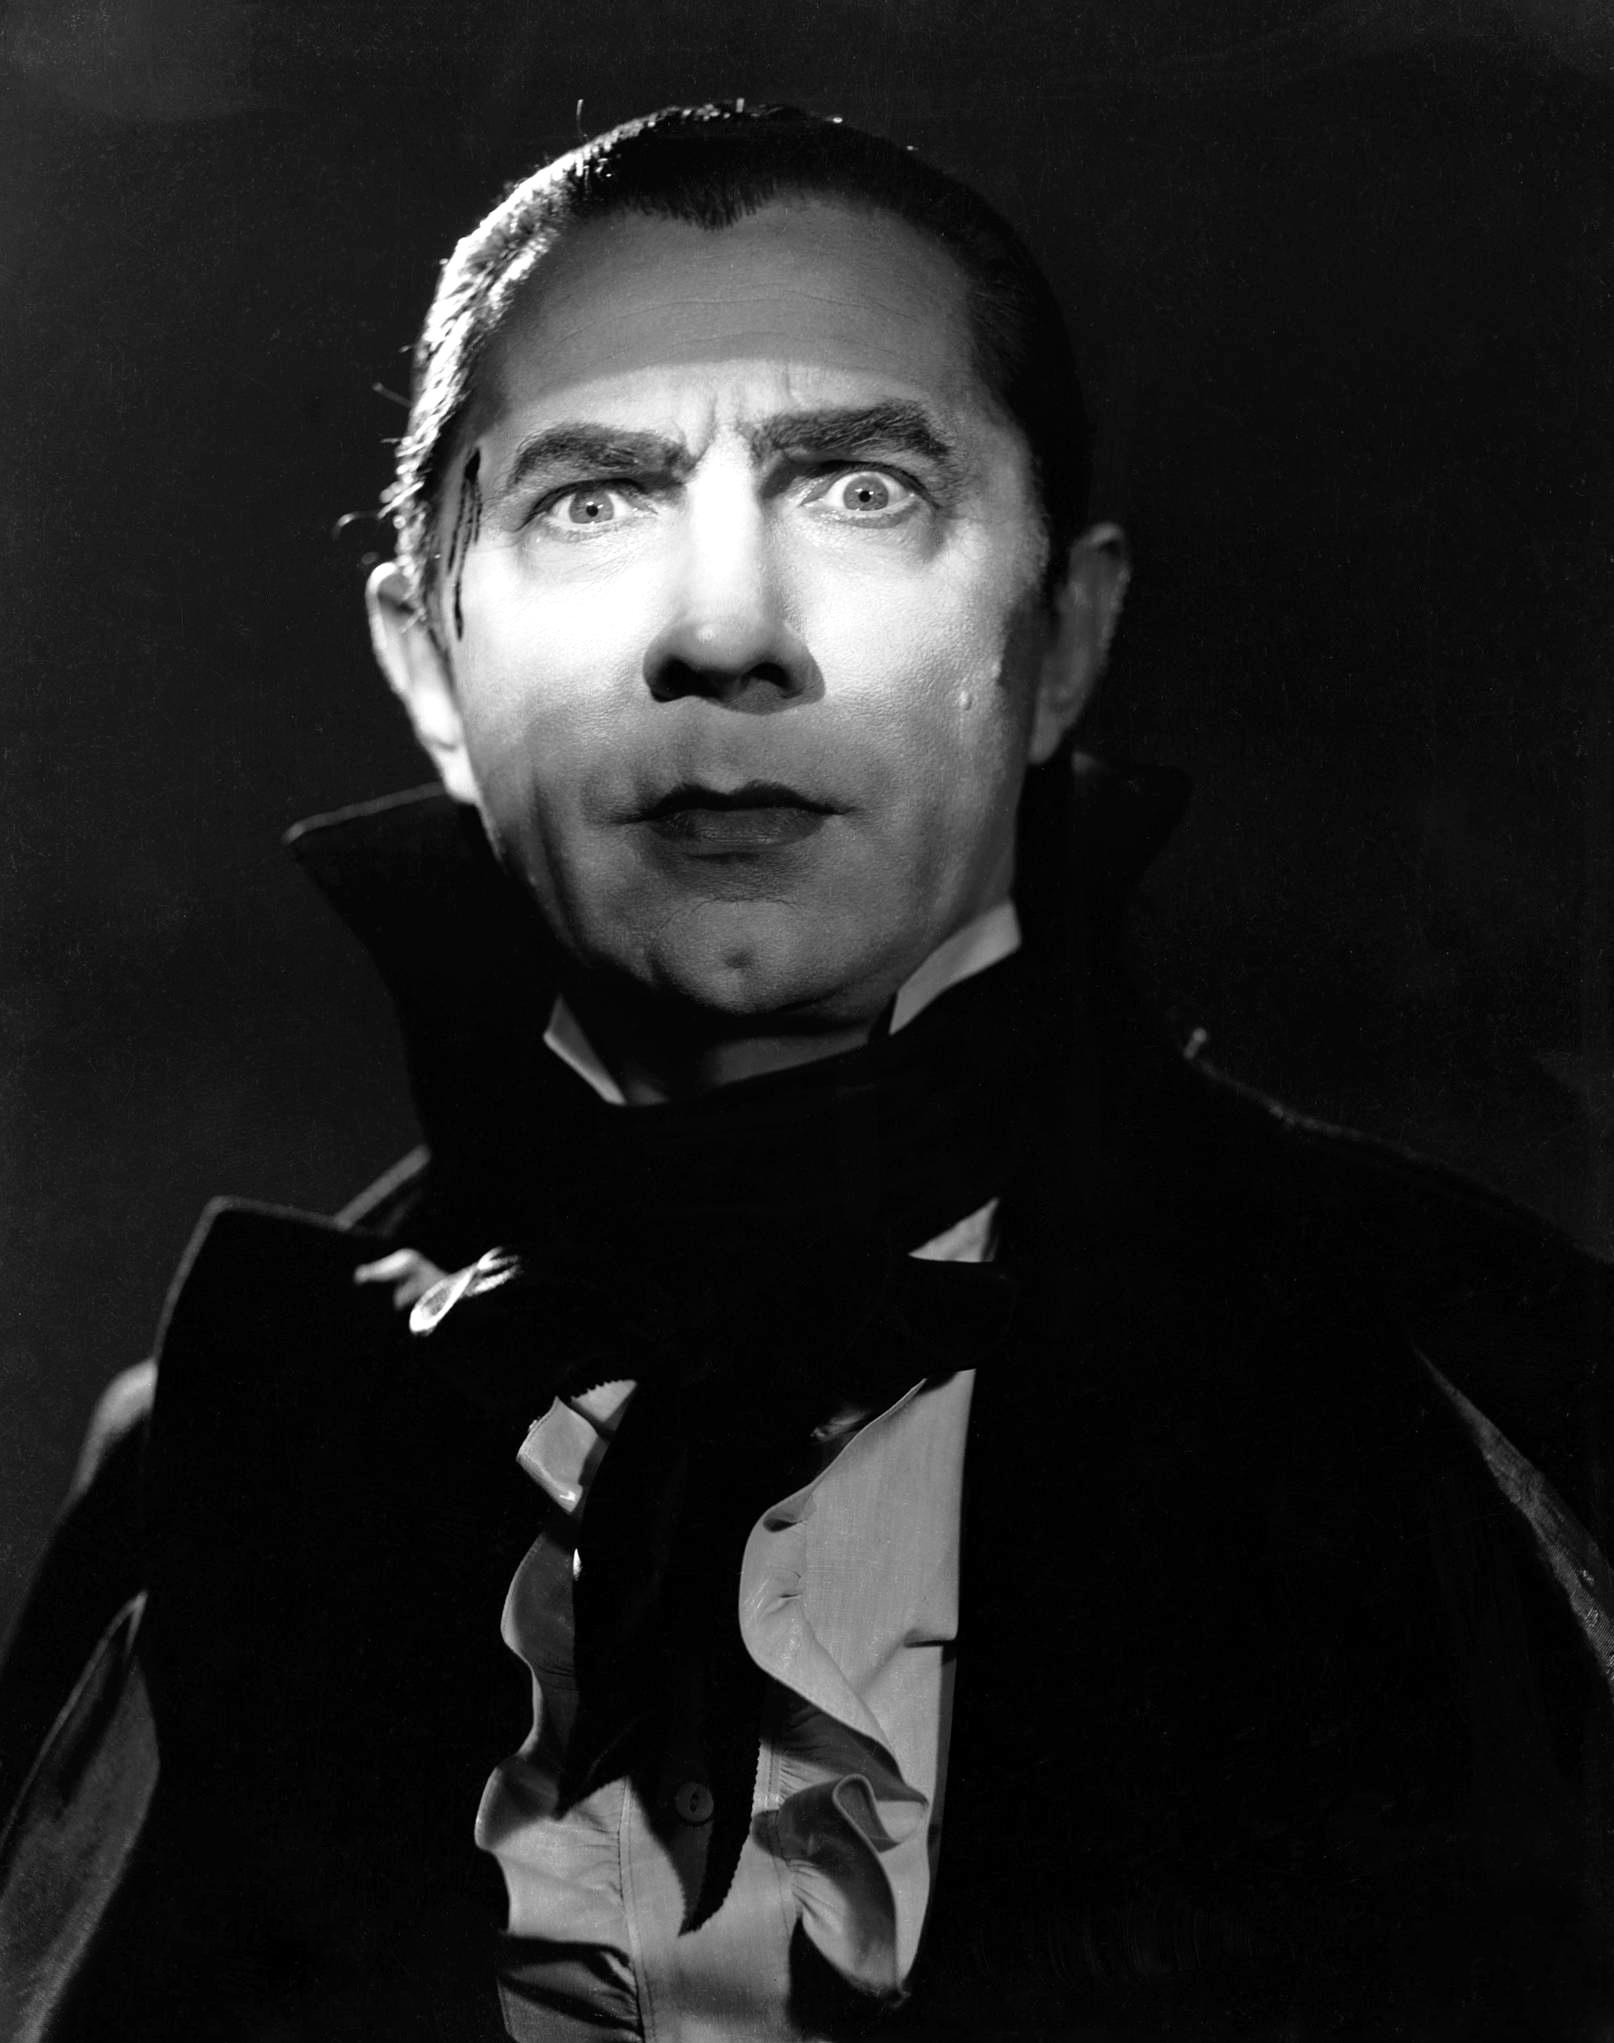 Annex - Lugosi, Bela (Mark of the Vampire)_02.jpg